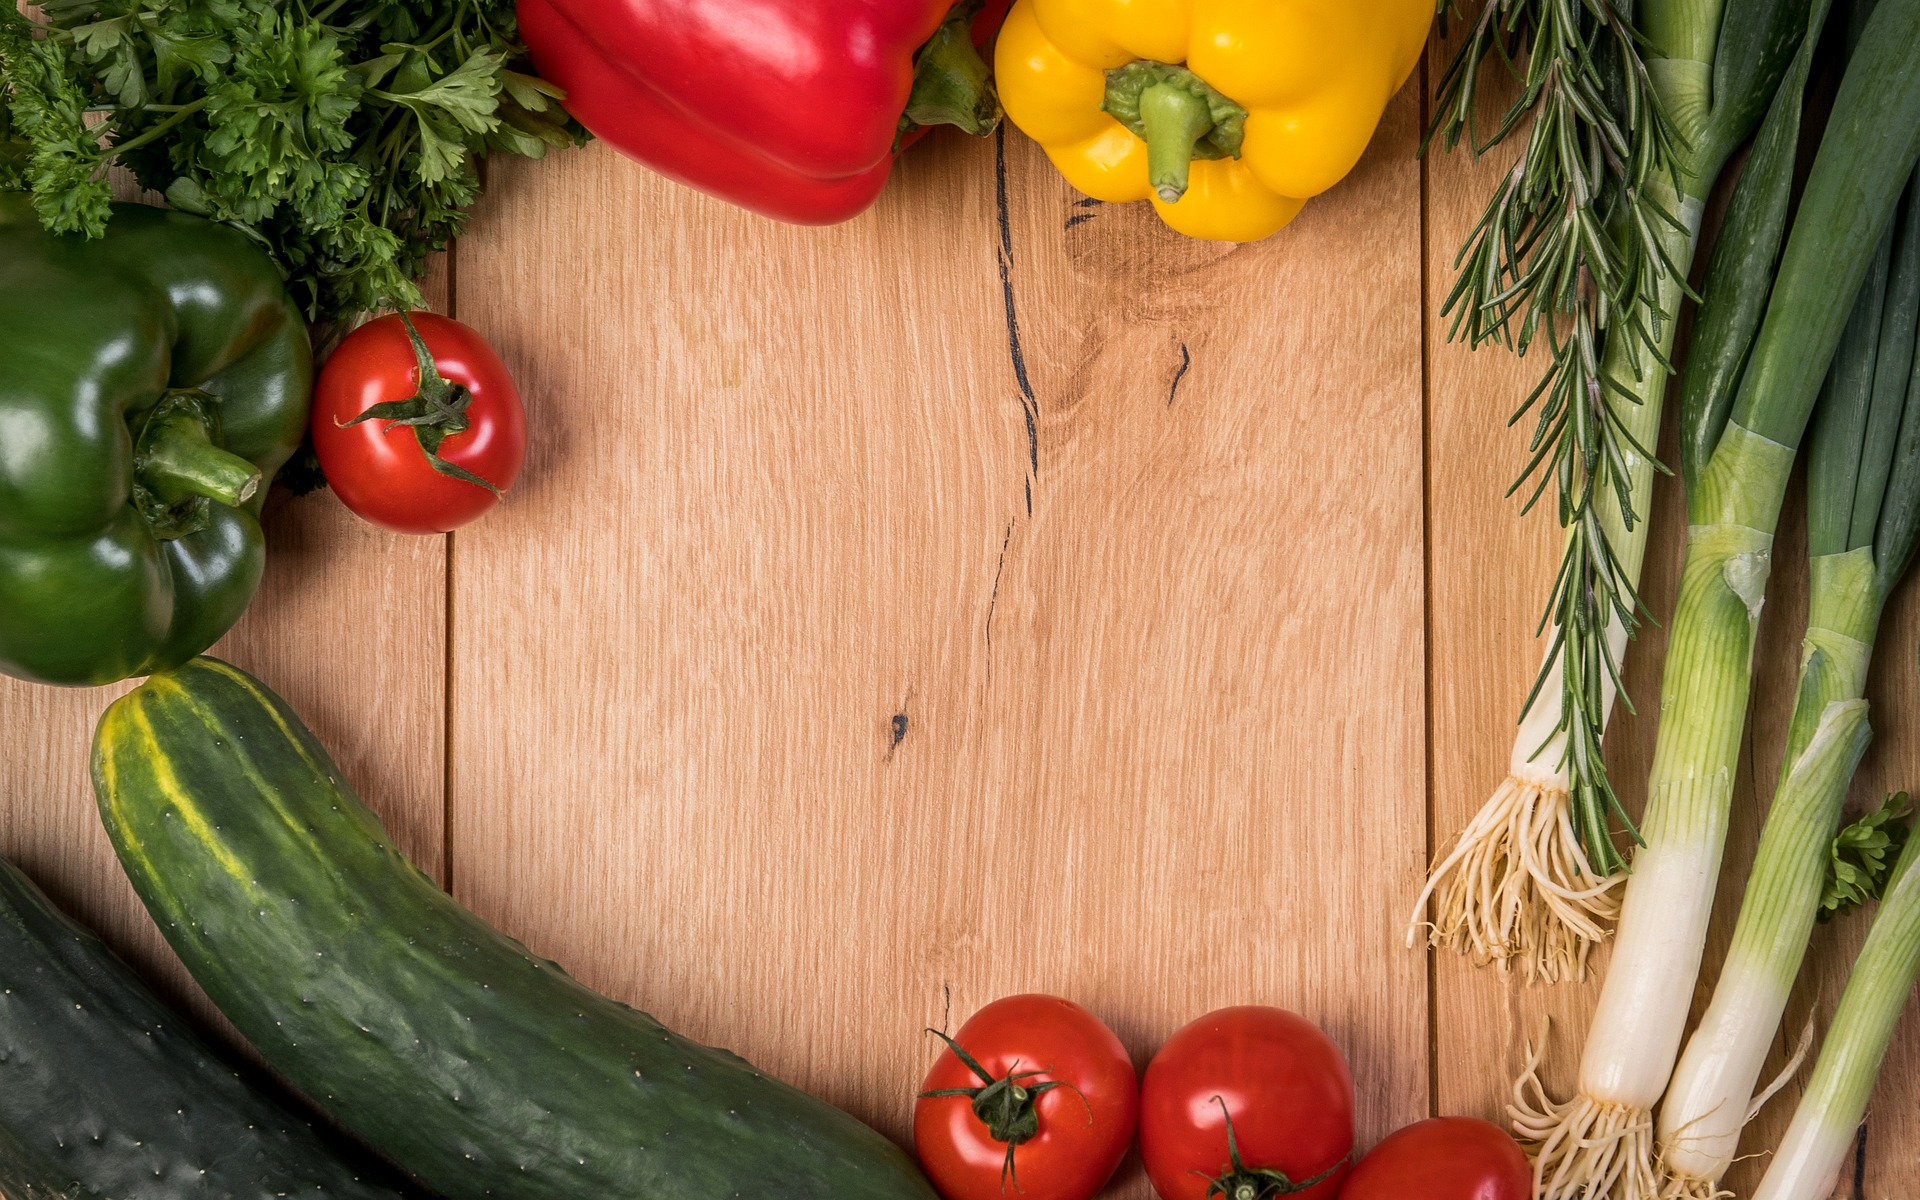 vegetables-2977888_1920.jpg